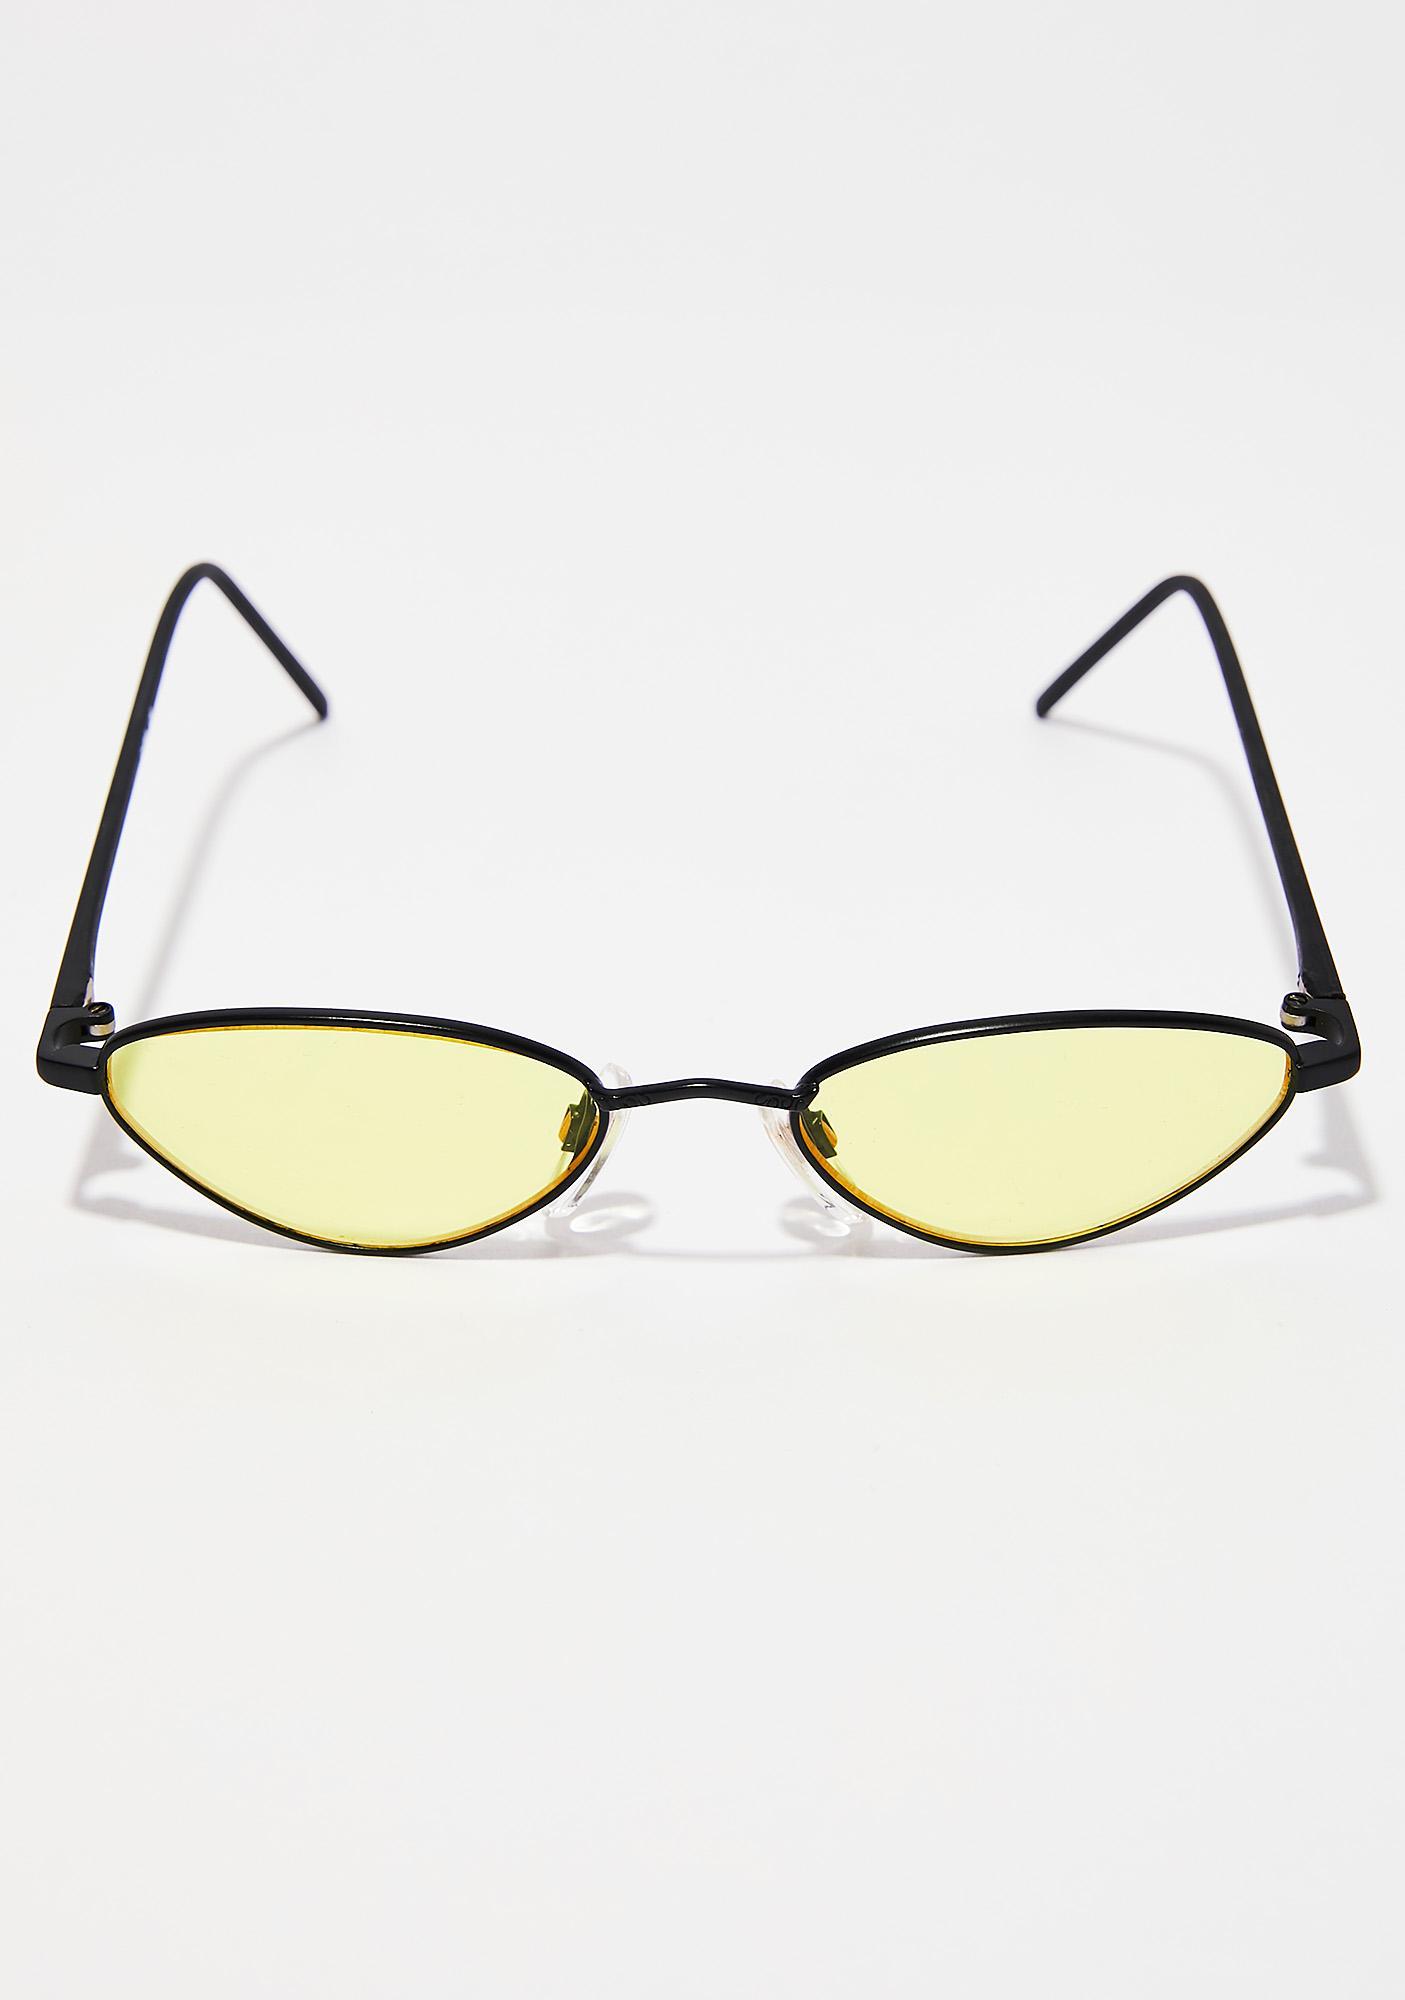 Truly Radiant Cat Eye Sunglasses